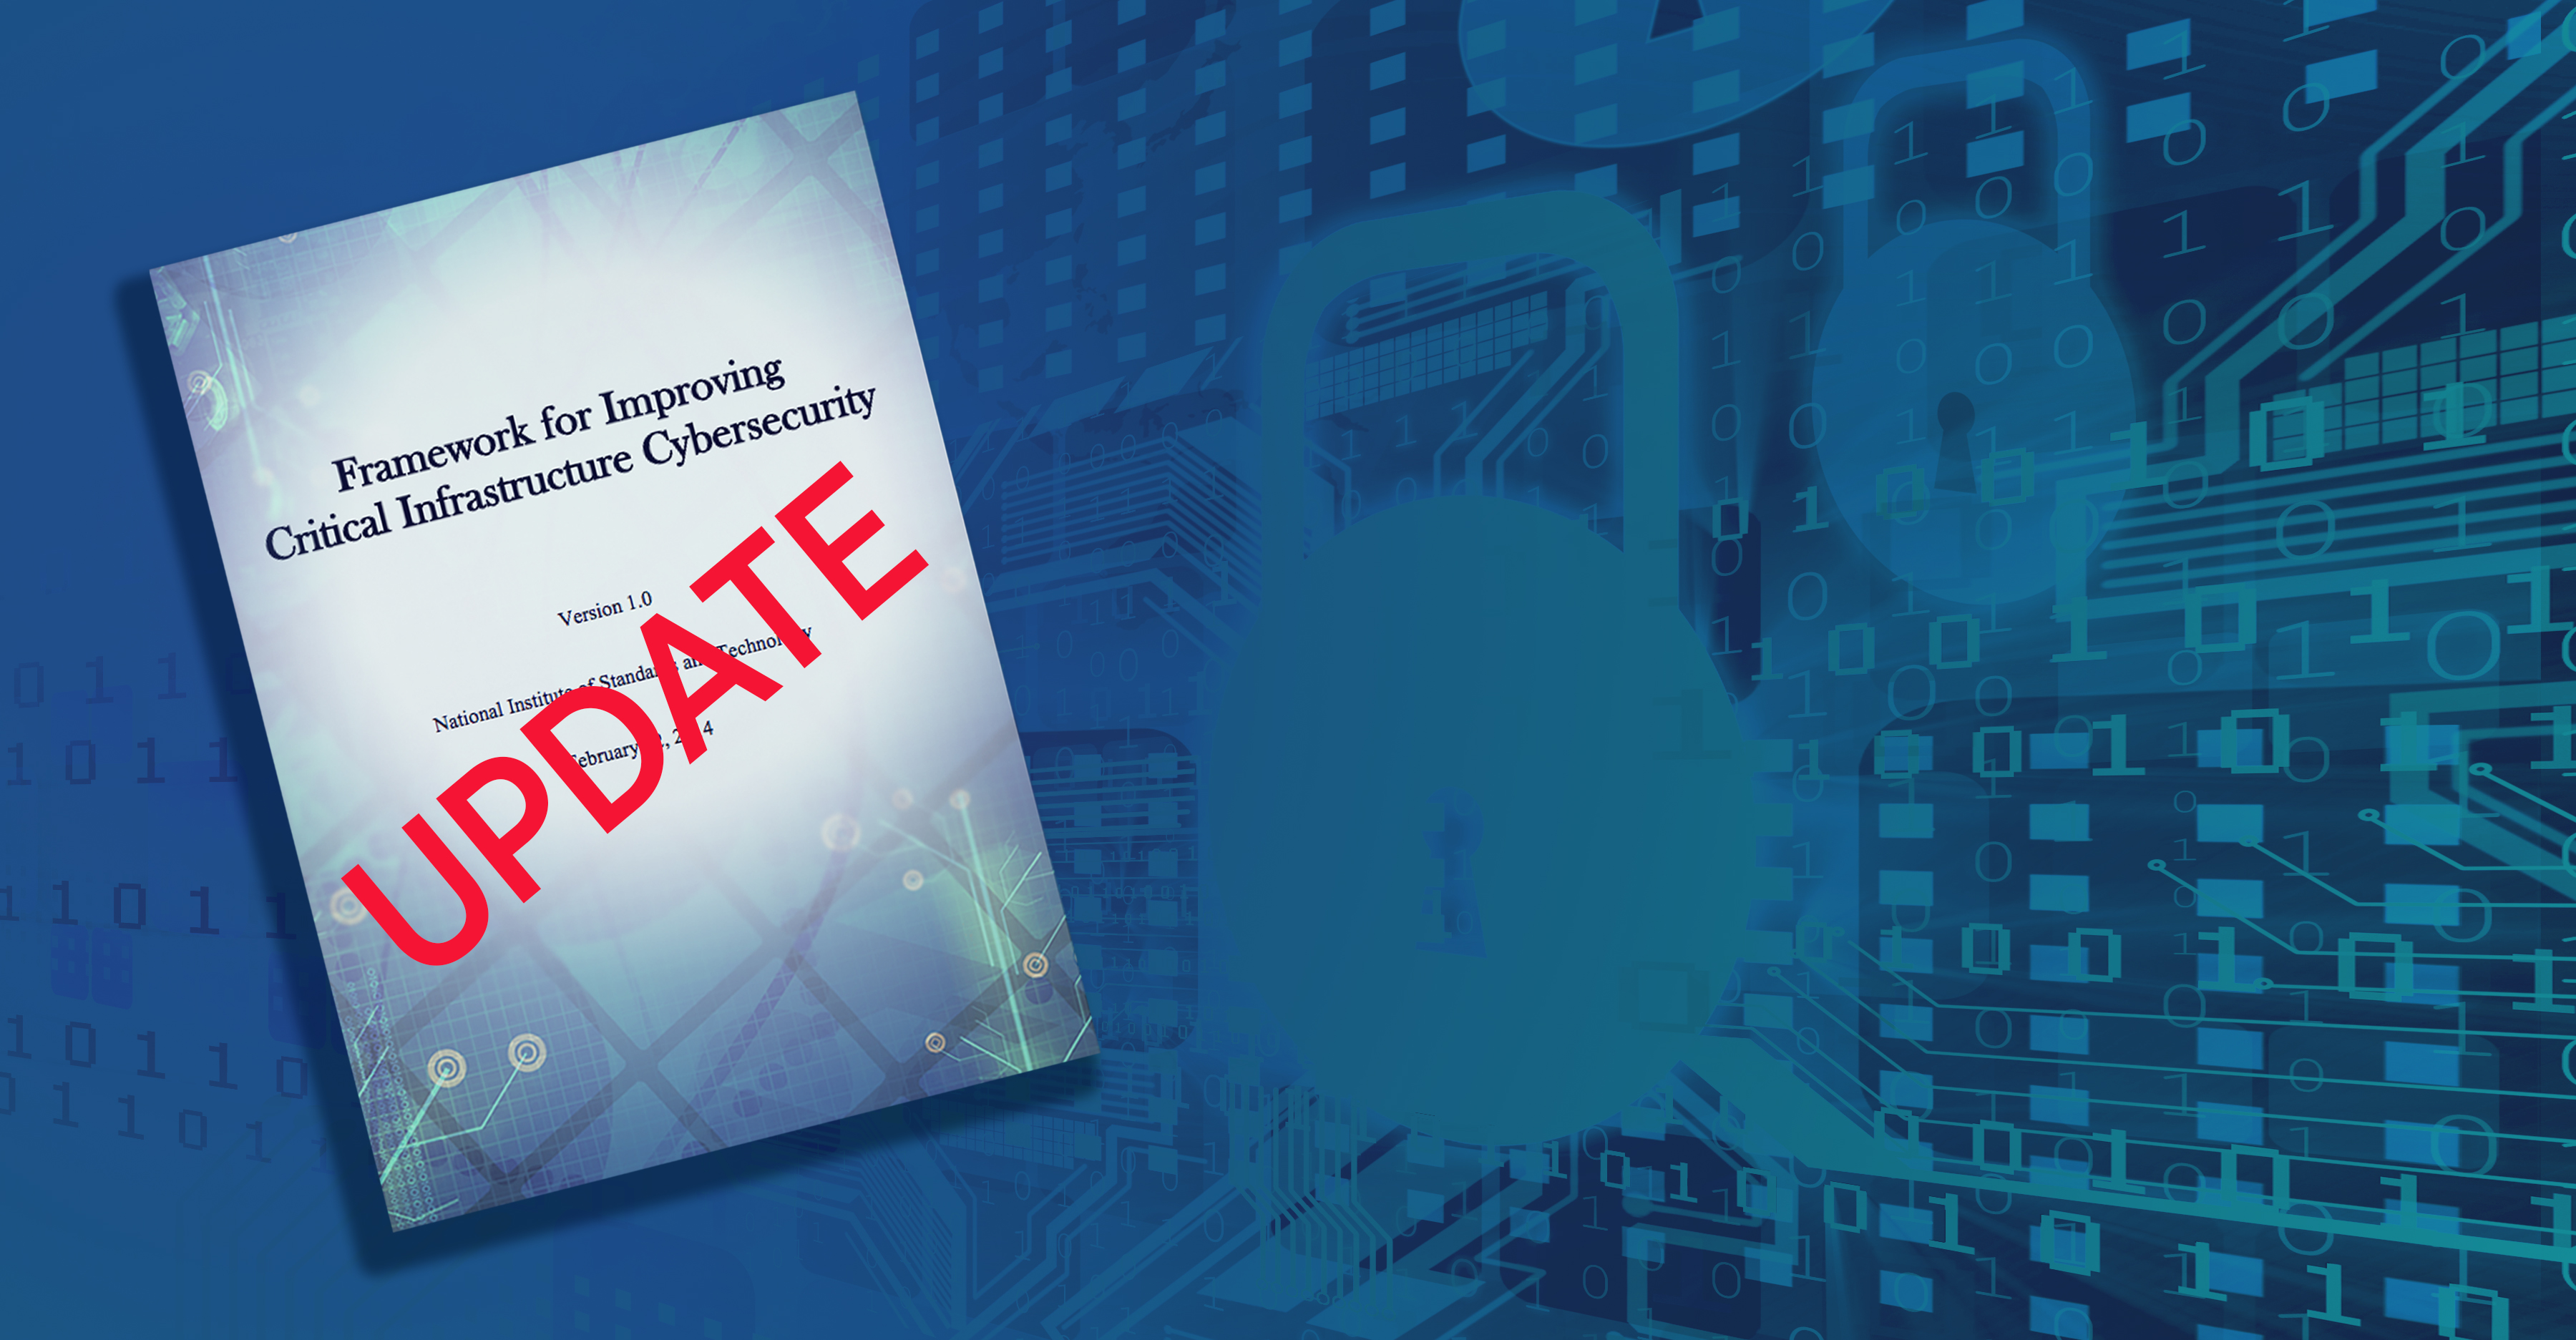 Calendar Organization Software : Nist releases update to cybersecurity framework